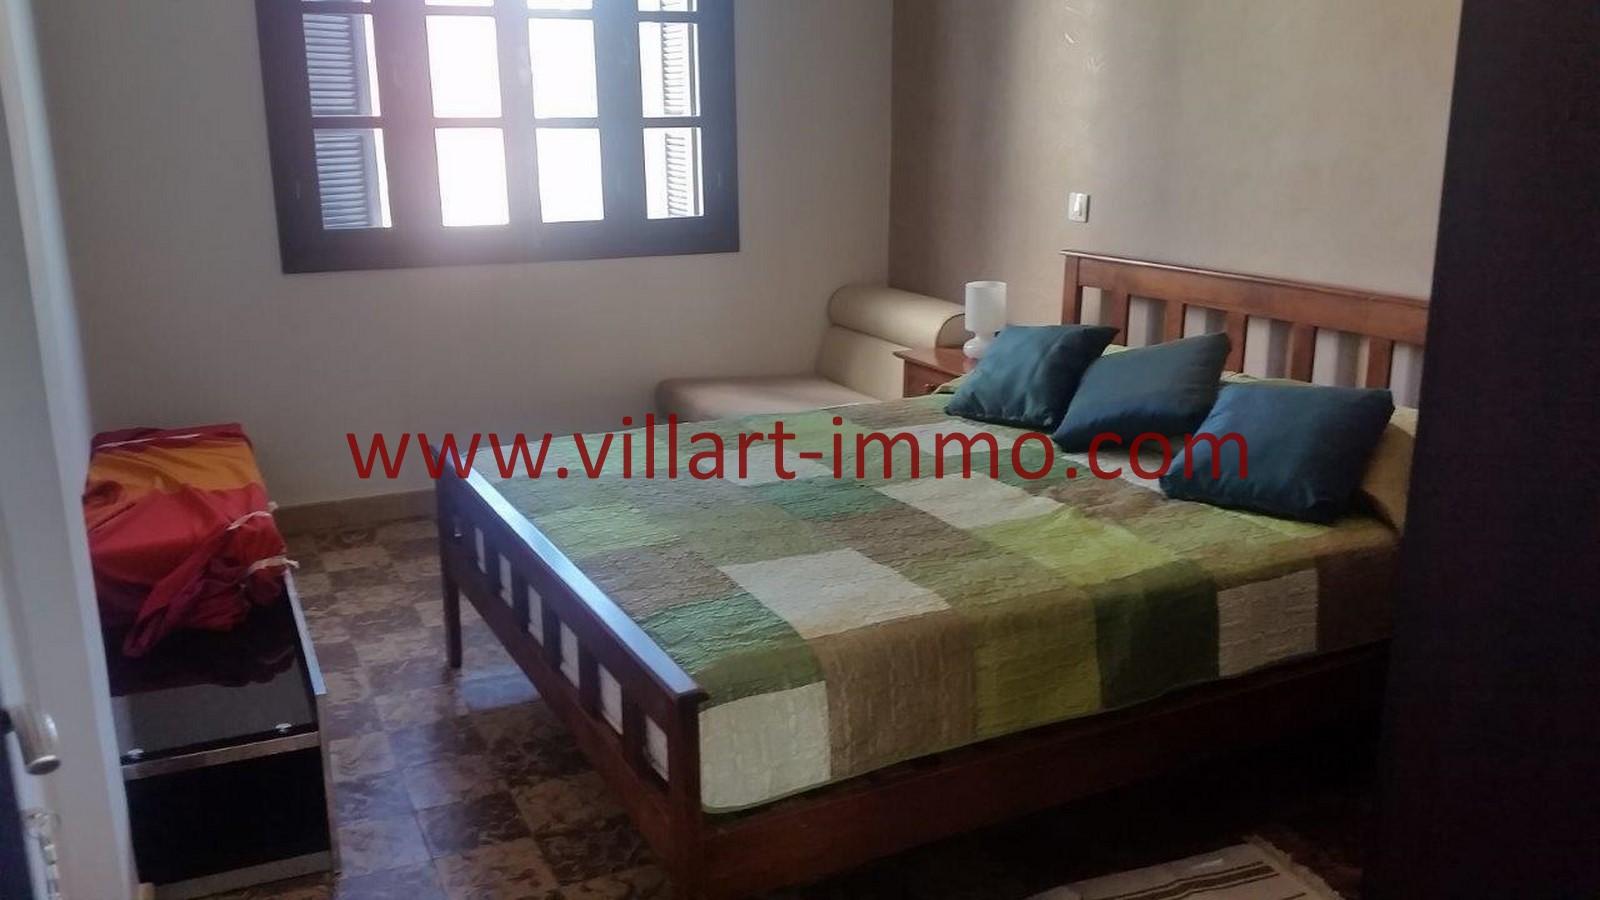 4-location-appartement-meuble-centre-ville-tanger-chambre-1-l966-villart-immo